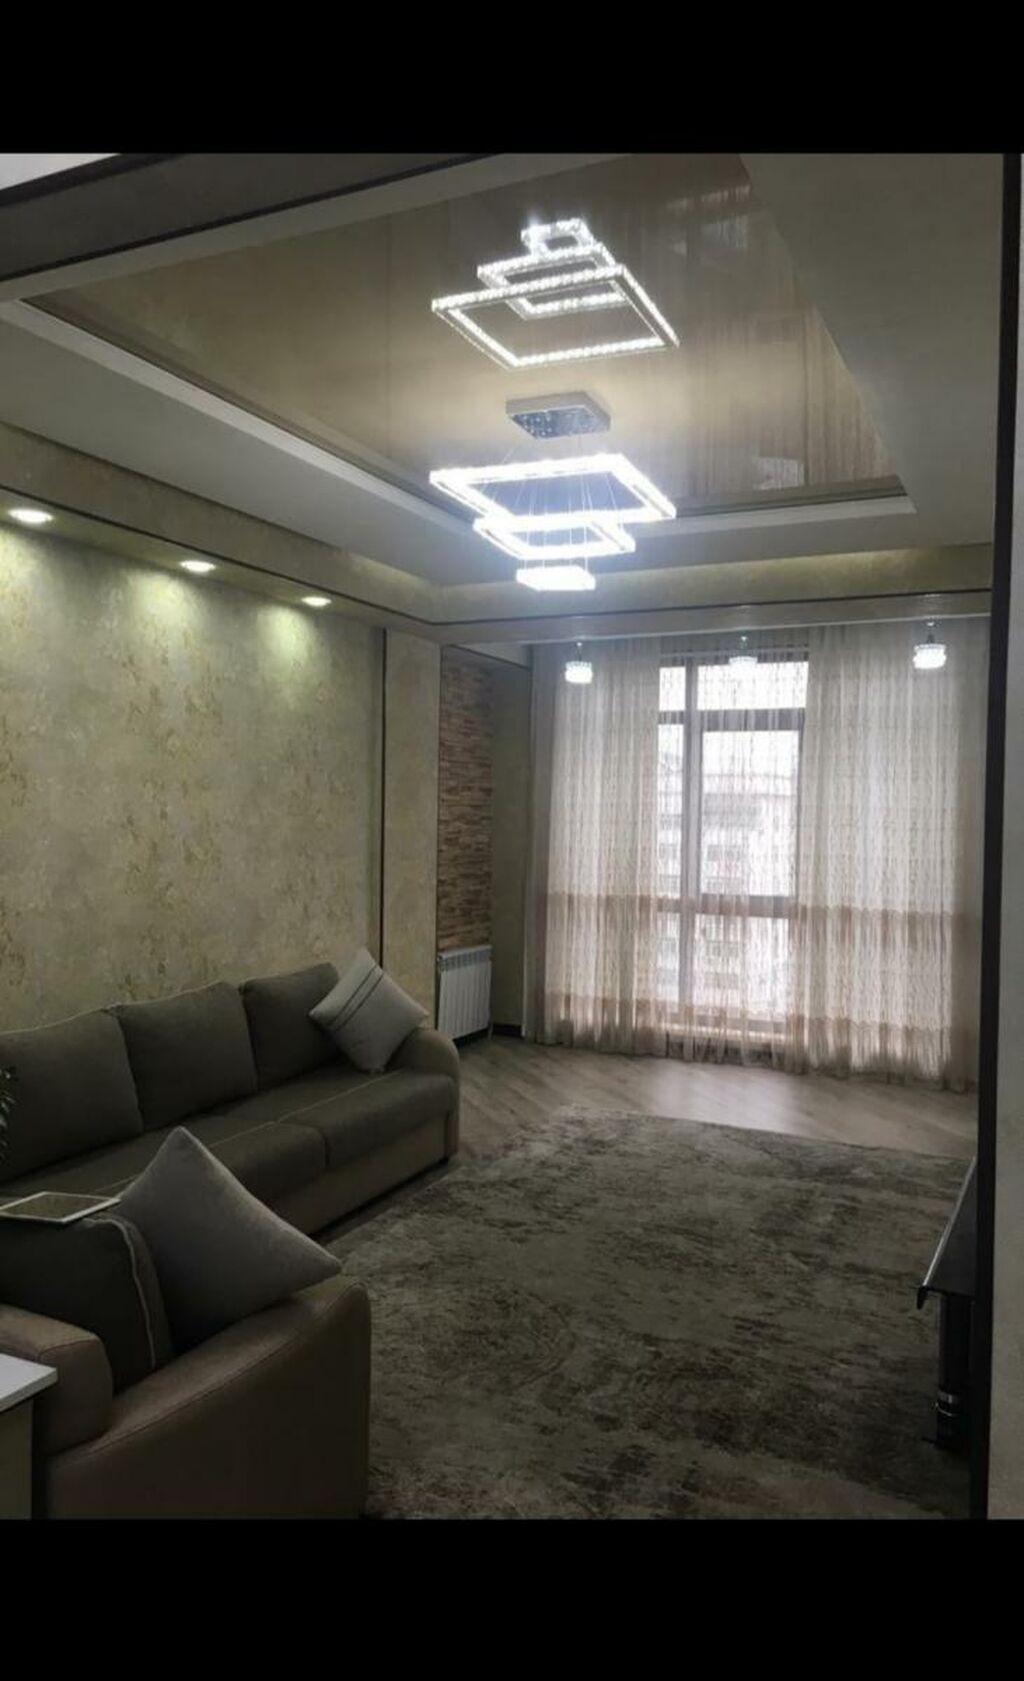 Сдается квартира: 2 комнаты, 90 кв. м, Бишкек: Сдается квартира: 2 комнаты, 90 кв. м, Бишкек